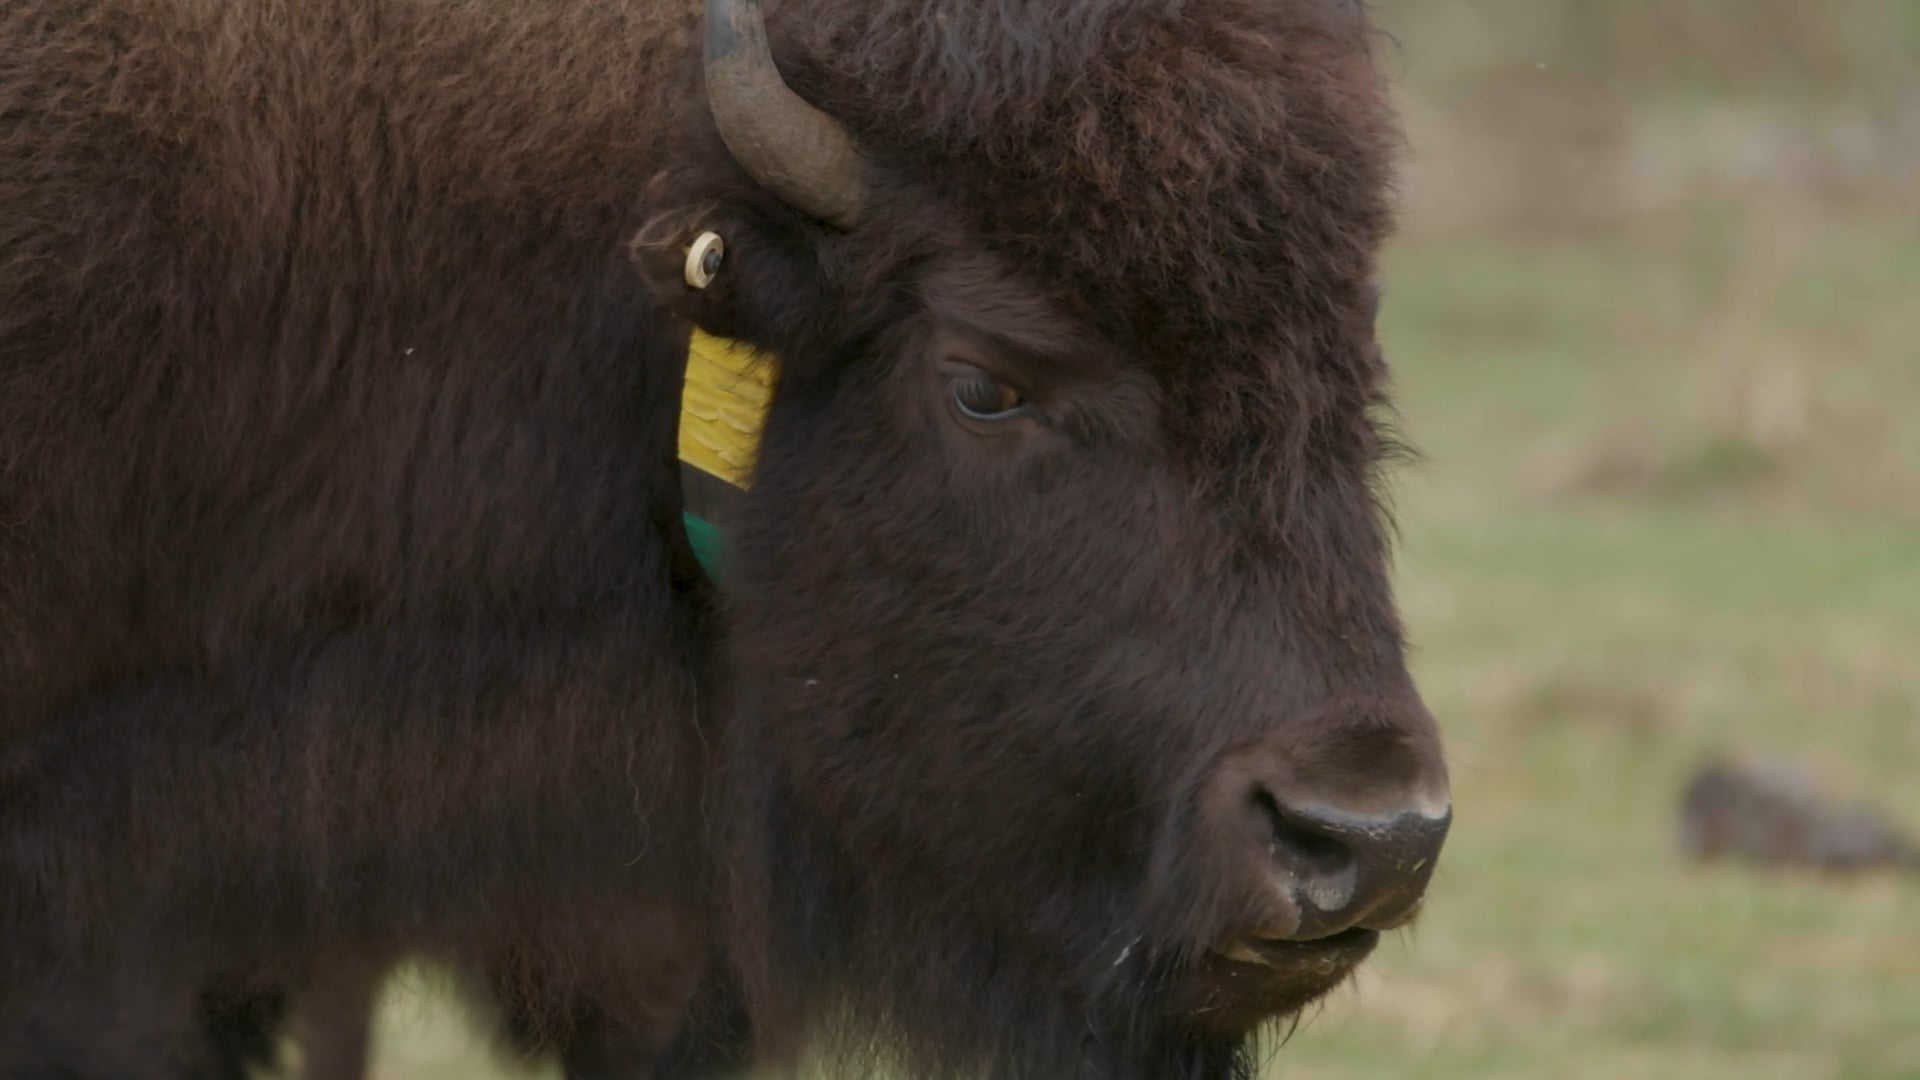 Parks Canada - Bison Release Preparation